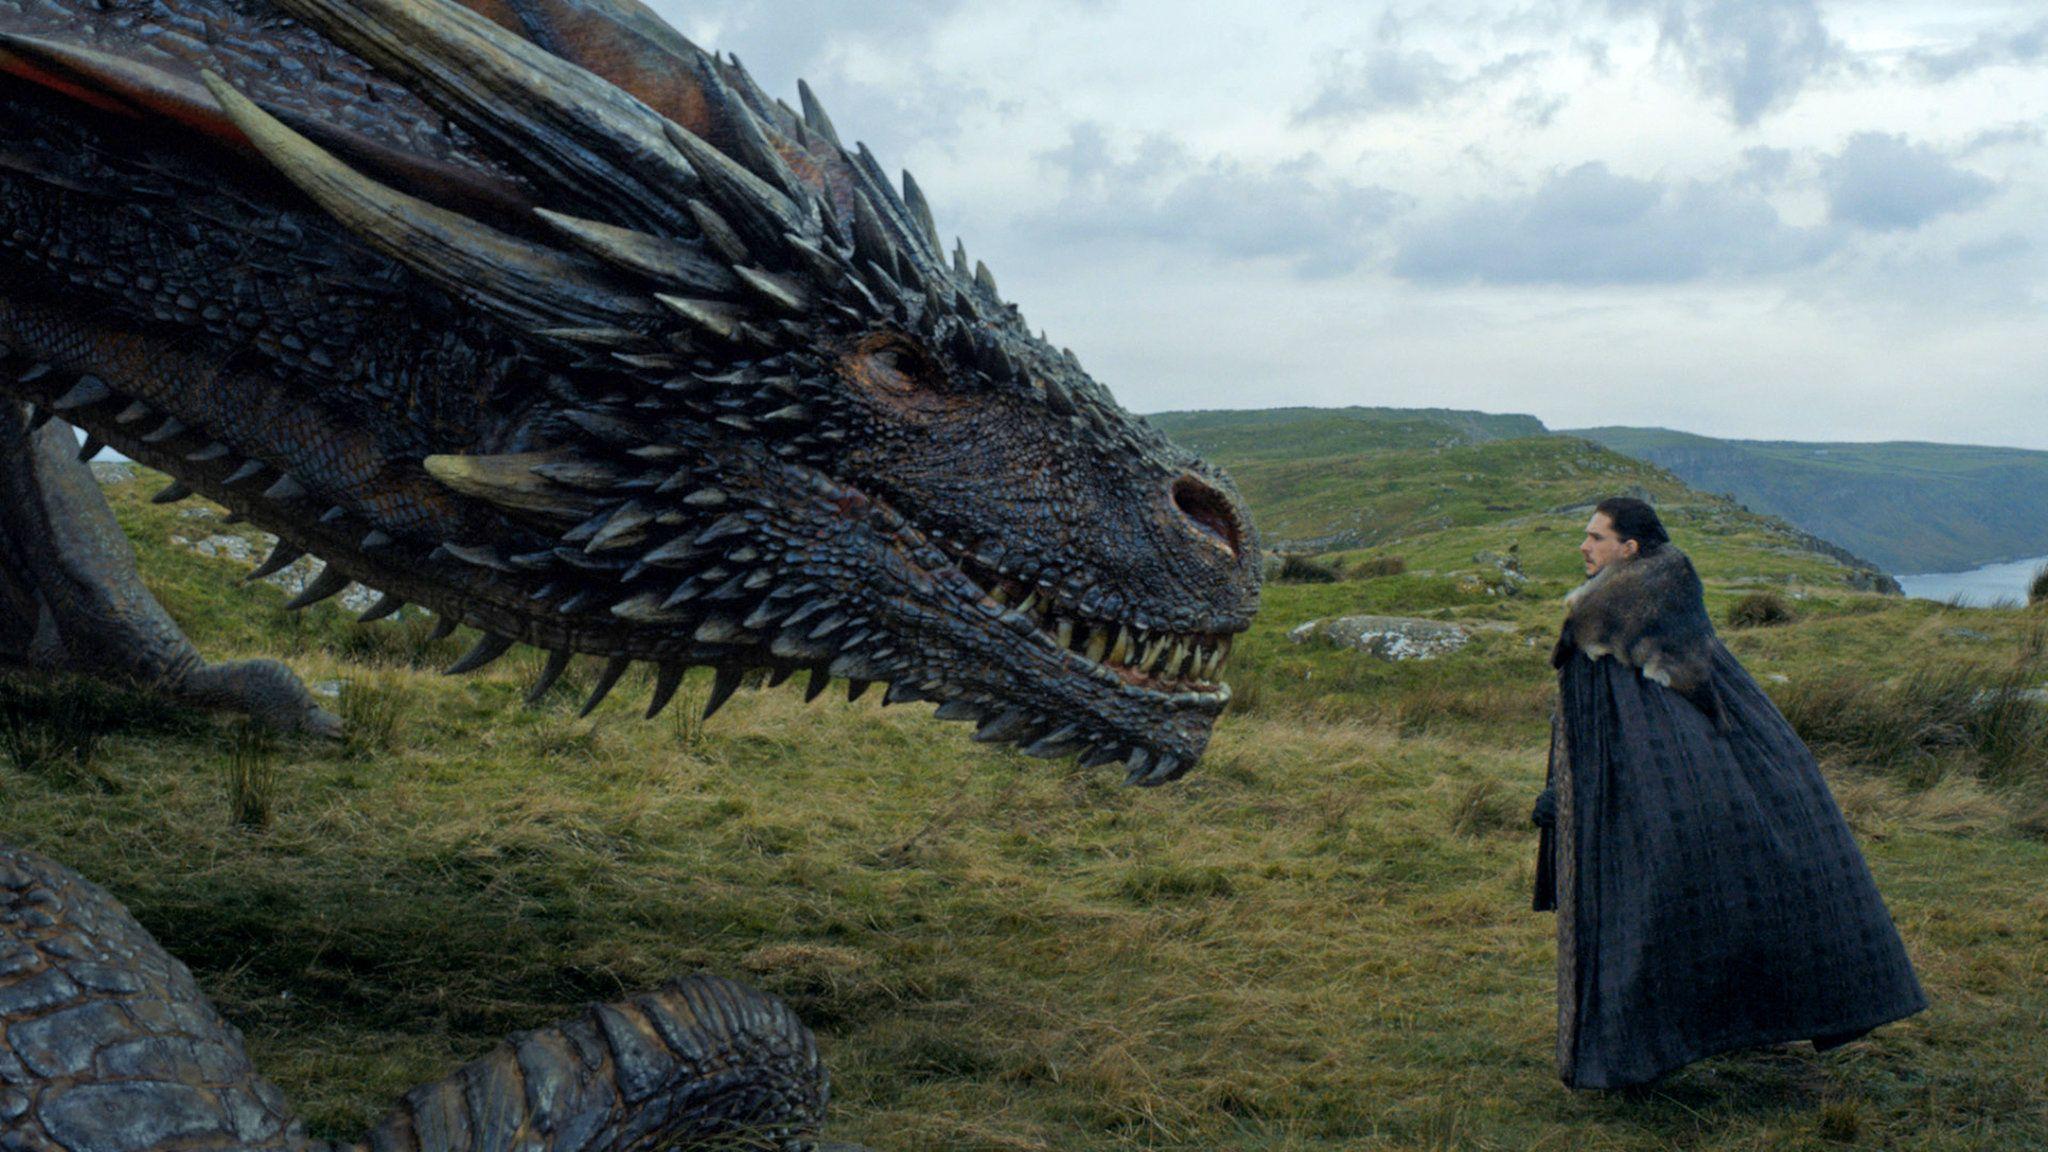 Why Didn't Drogon Kill Jon Snow for Killing Daenerys in 'Game of Thrones'?